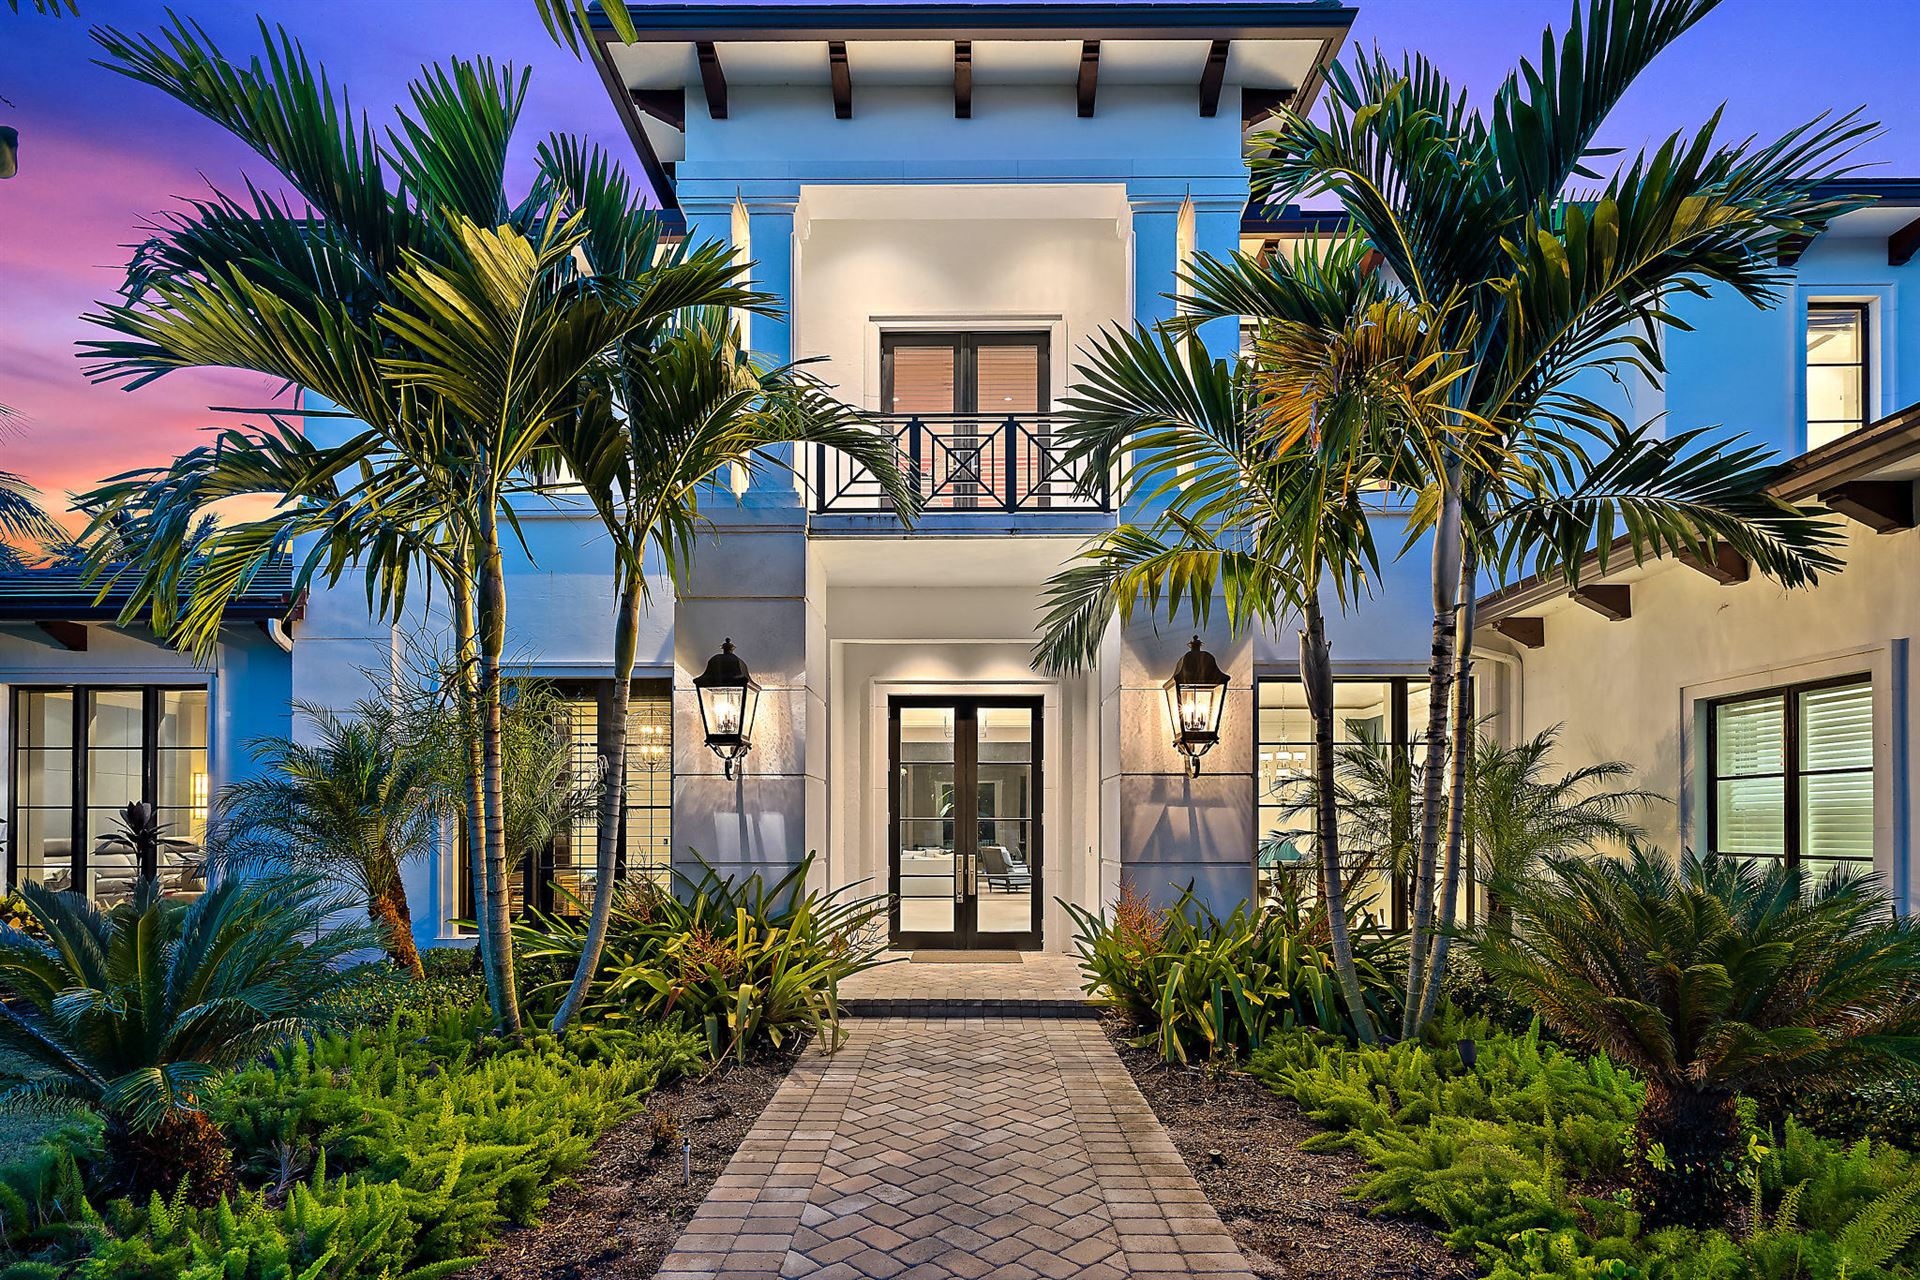 Photo of 12003 Cielo Court, Palm Beach Gardens, FL 33418 (MLS # RX-10568435)